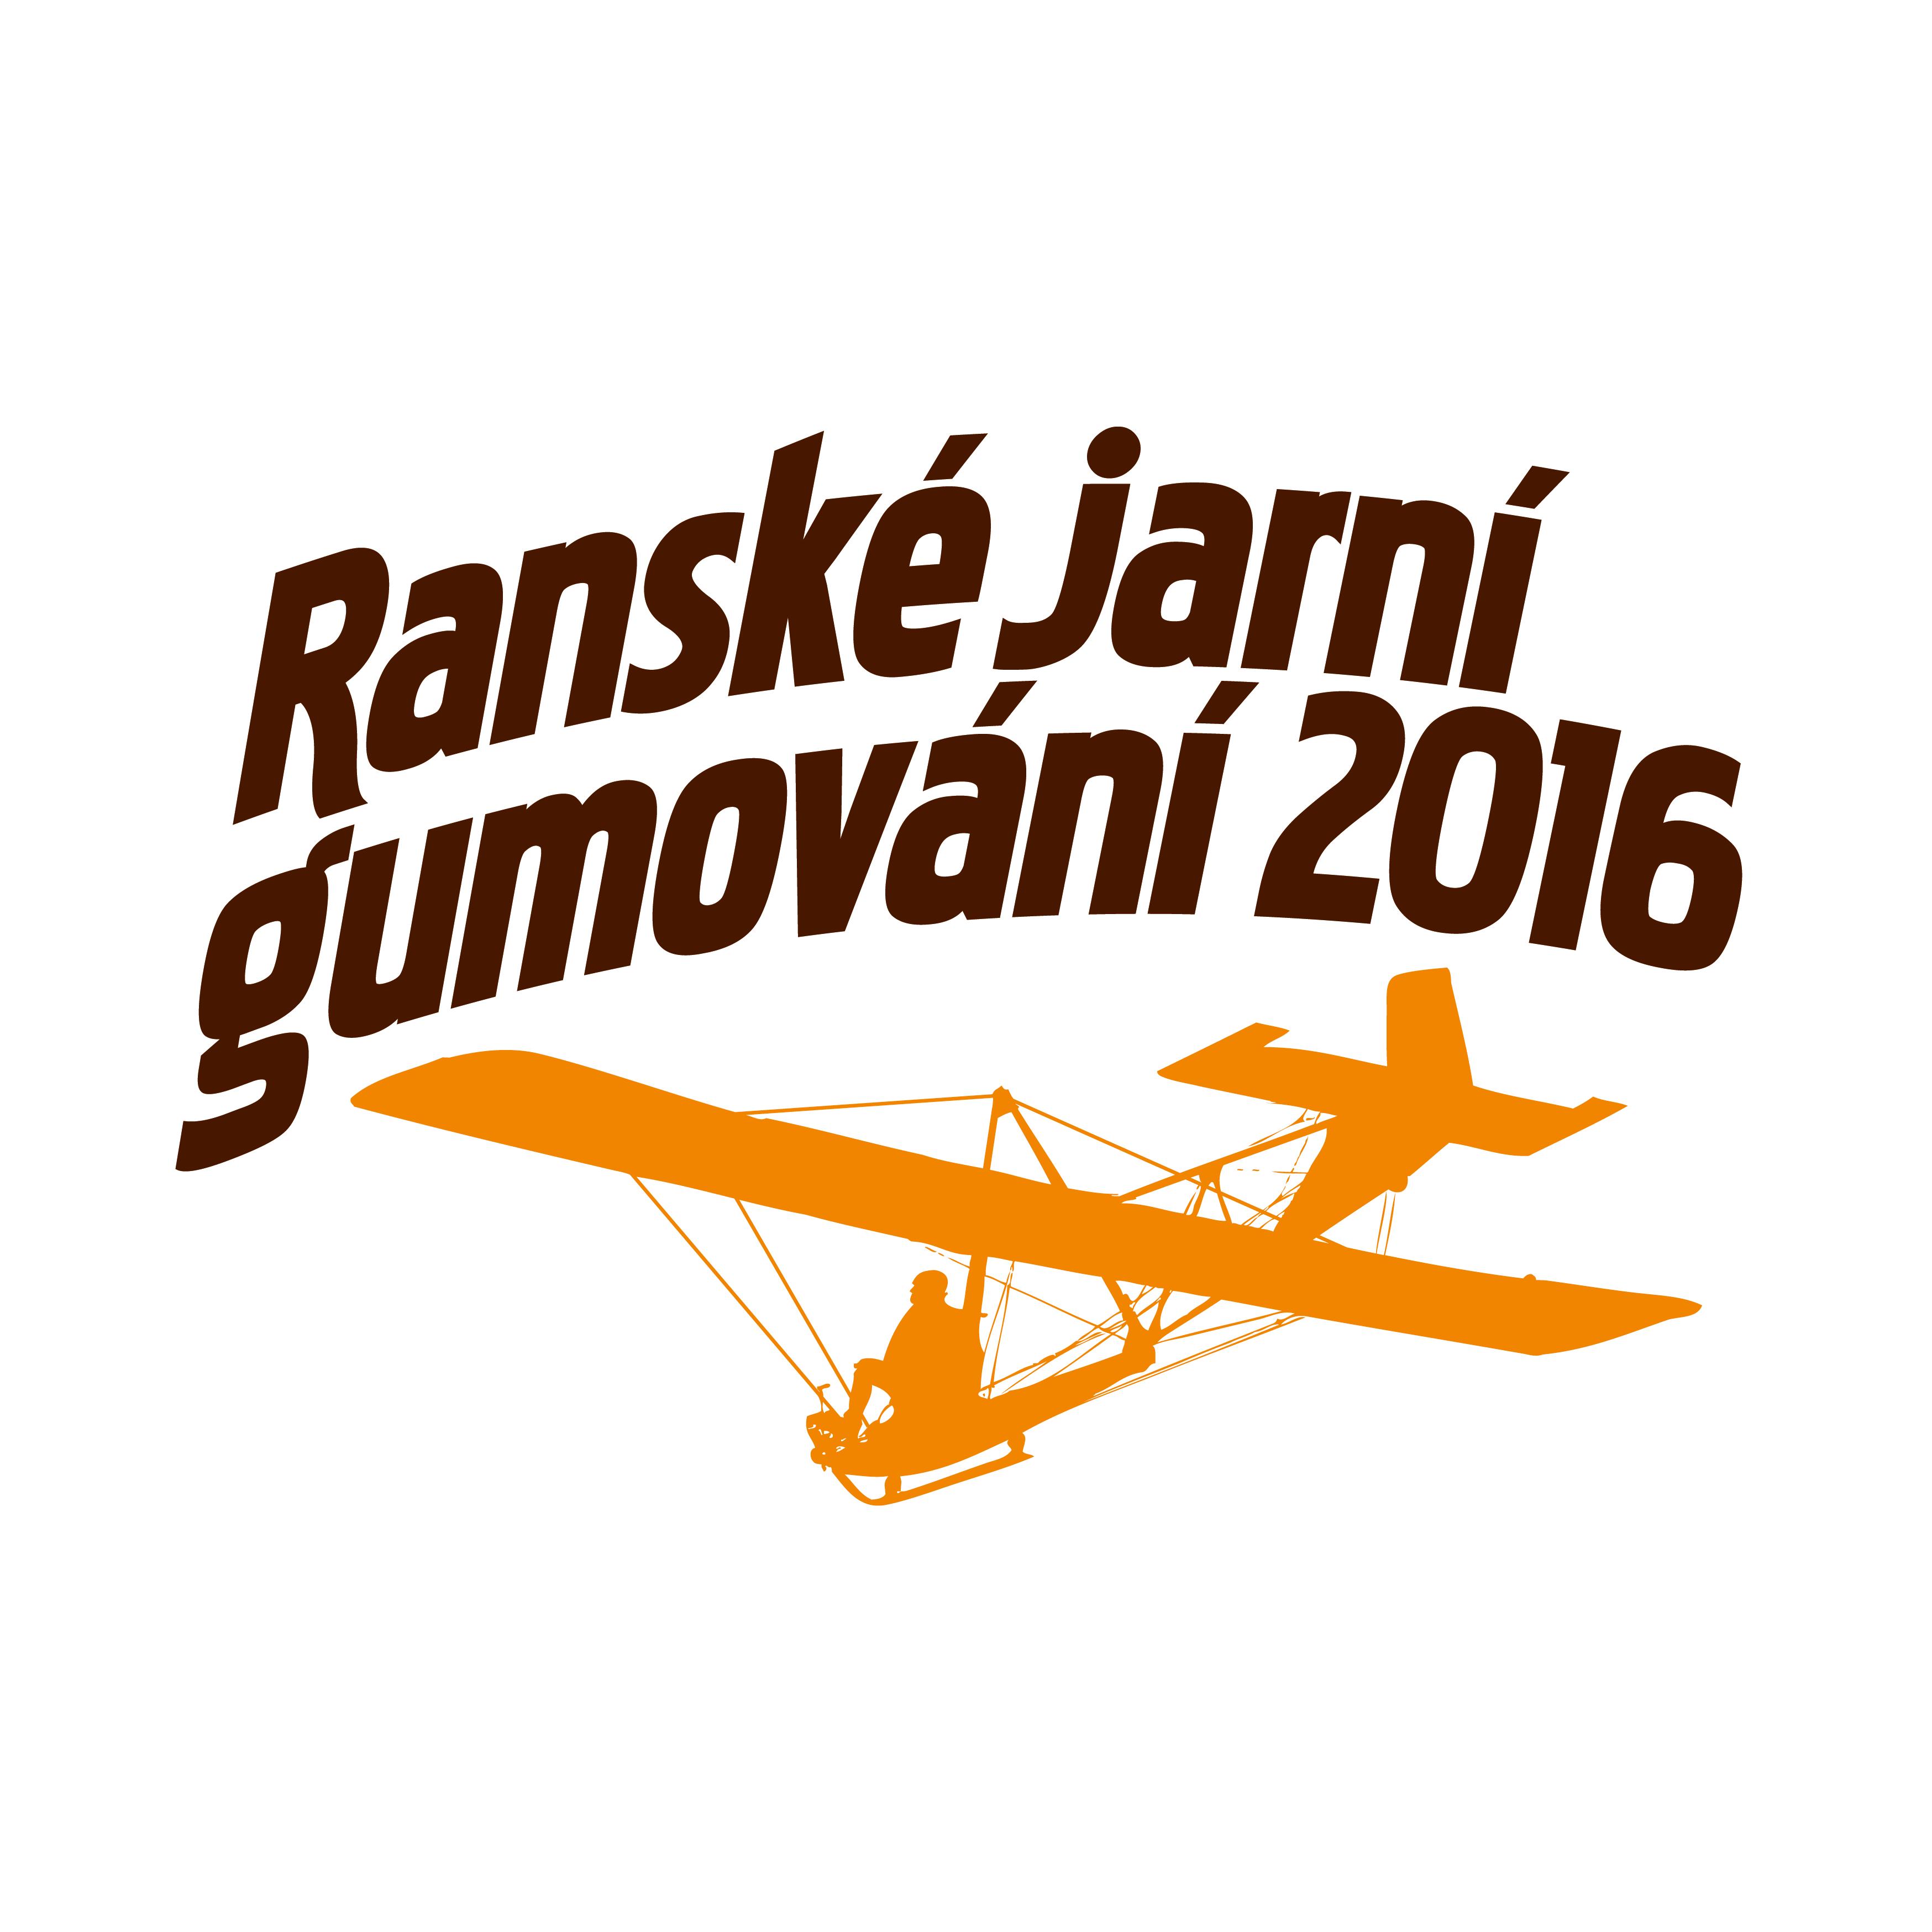 RA_gumovani_logo_PNG-Transparentni_2016_v2